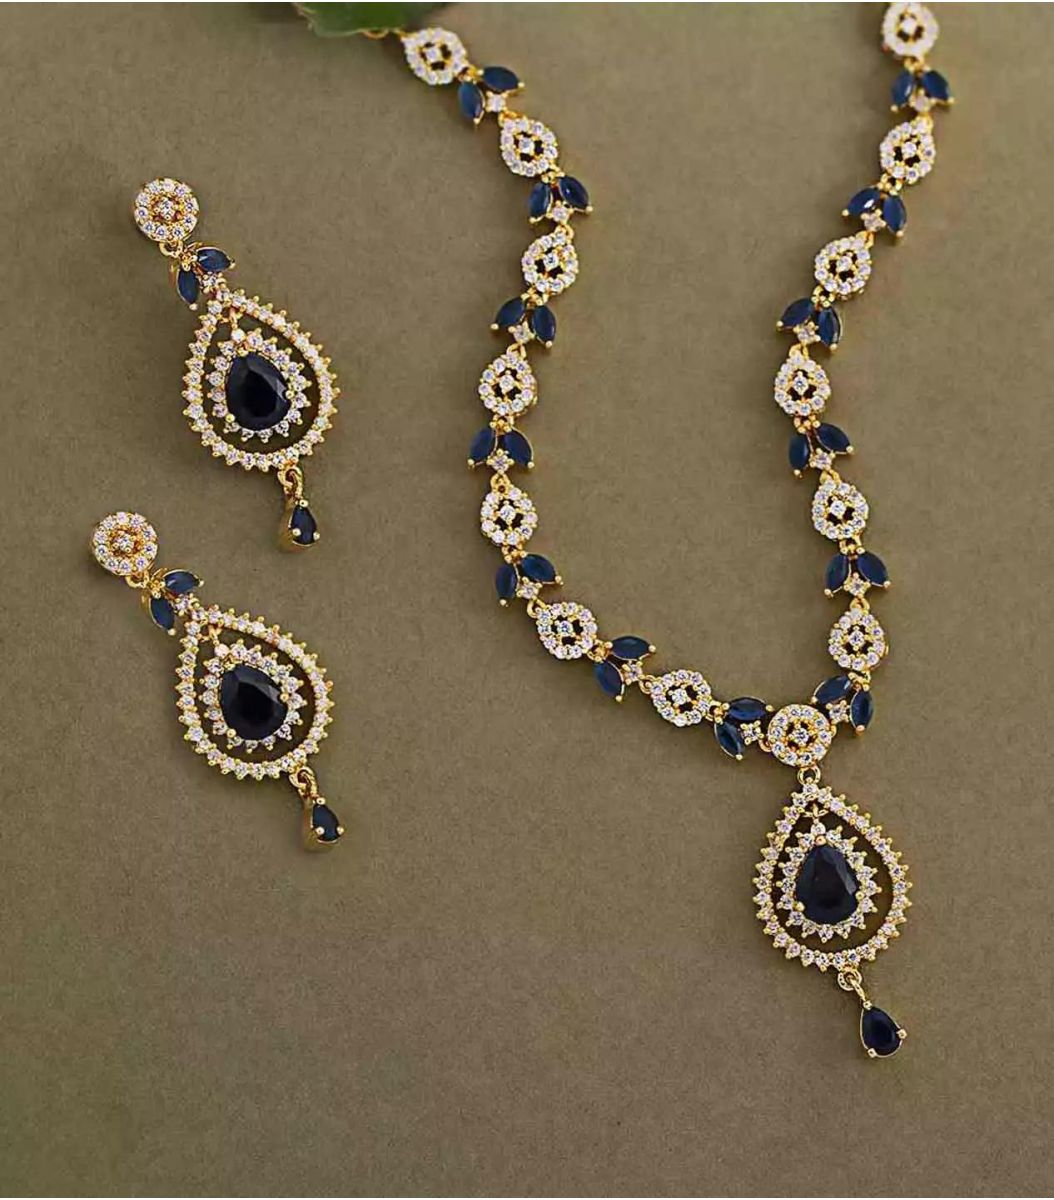 Silver Gold Polish Necklace FJ1660641